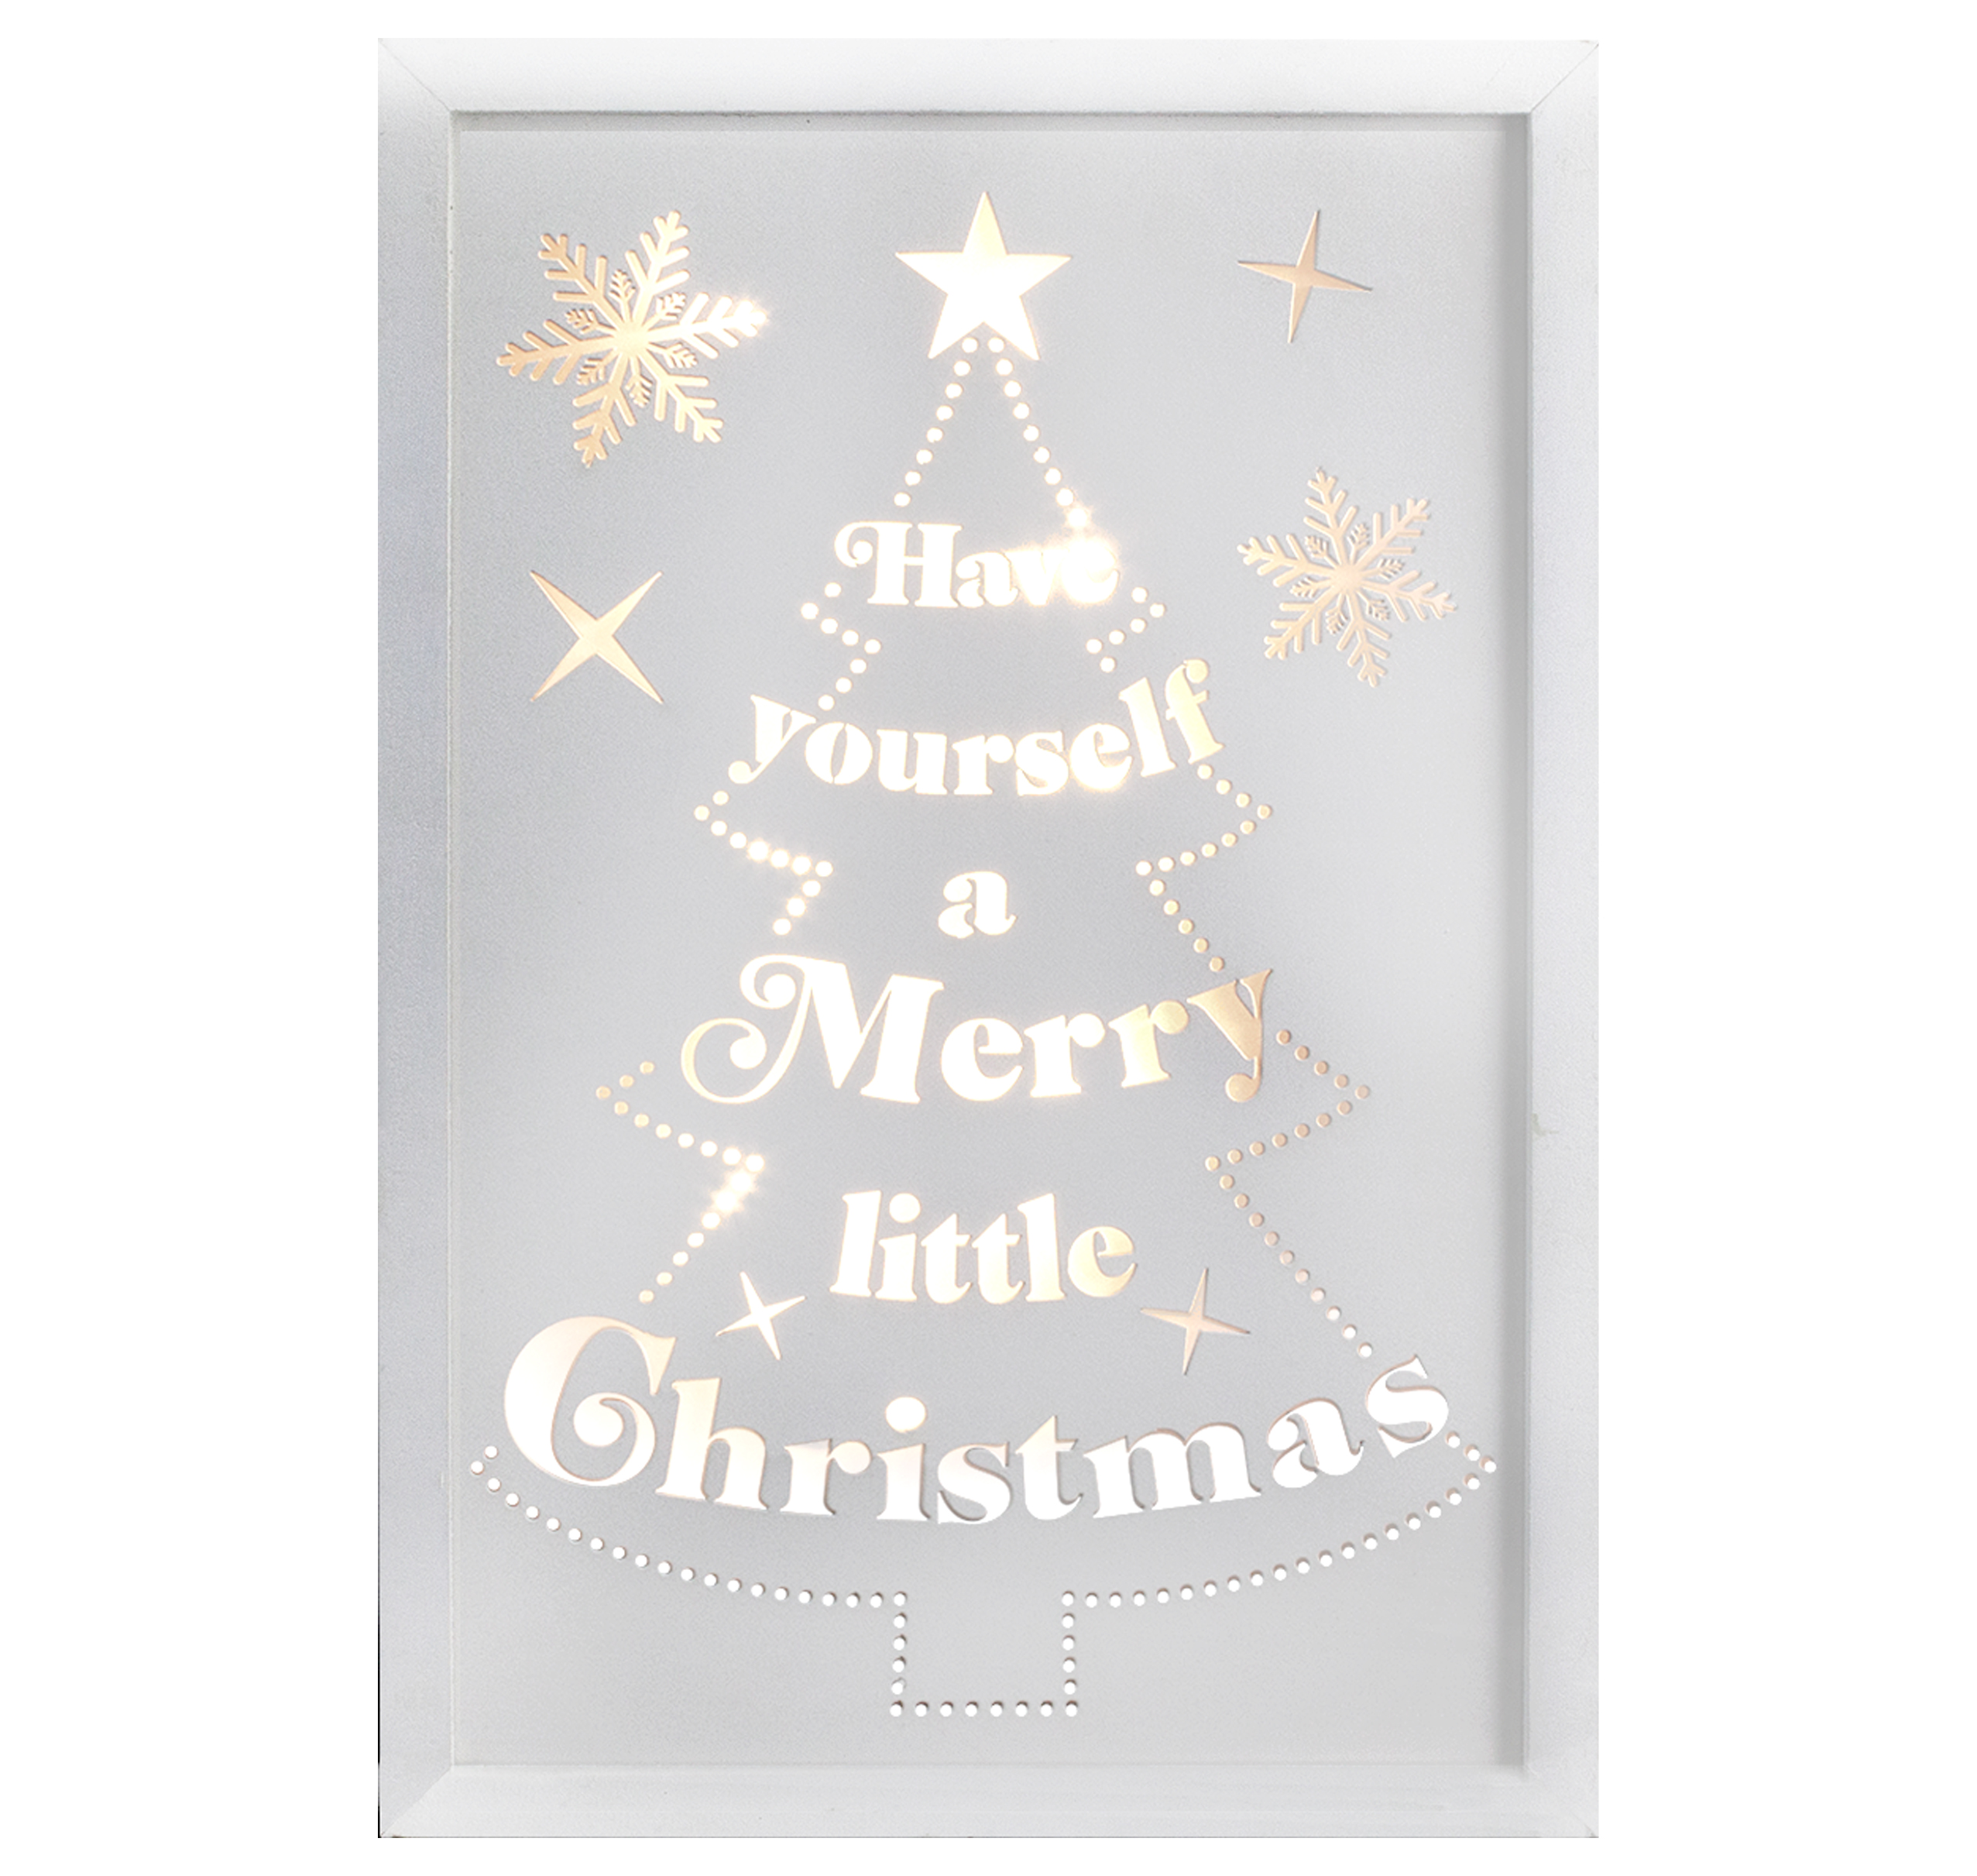 Décor Lites Wooden LED Box White Merry Little Christmas